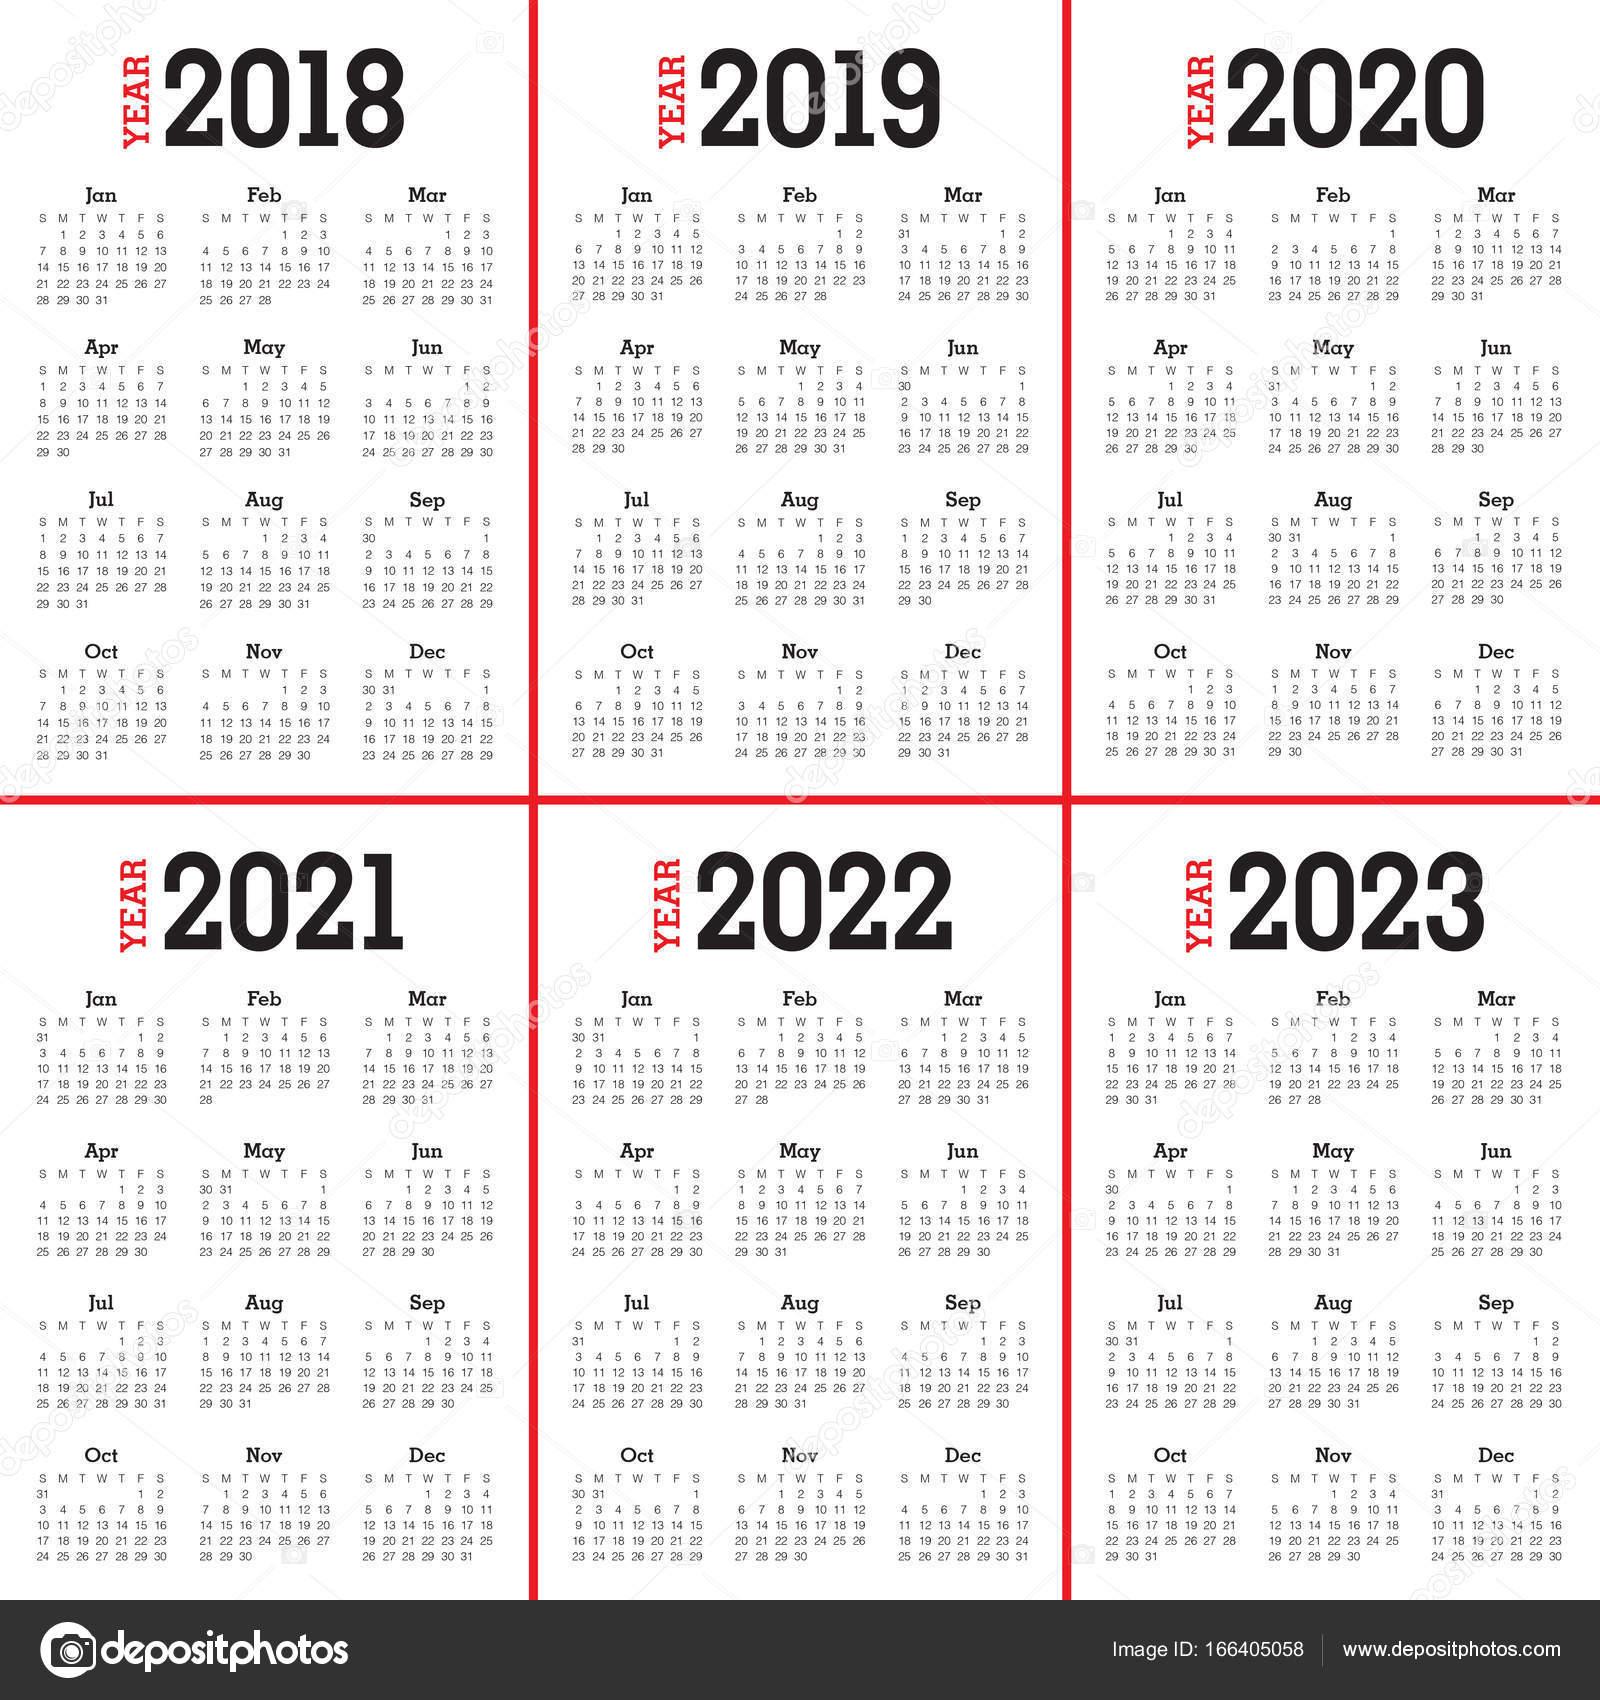 2018 2019 2020 2021 2022 2023 Года Календарь Вектор throughout Three Year Calendar 2020 2021 2022